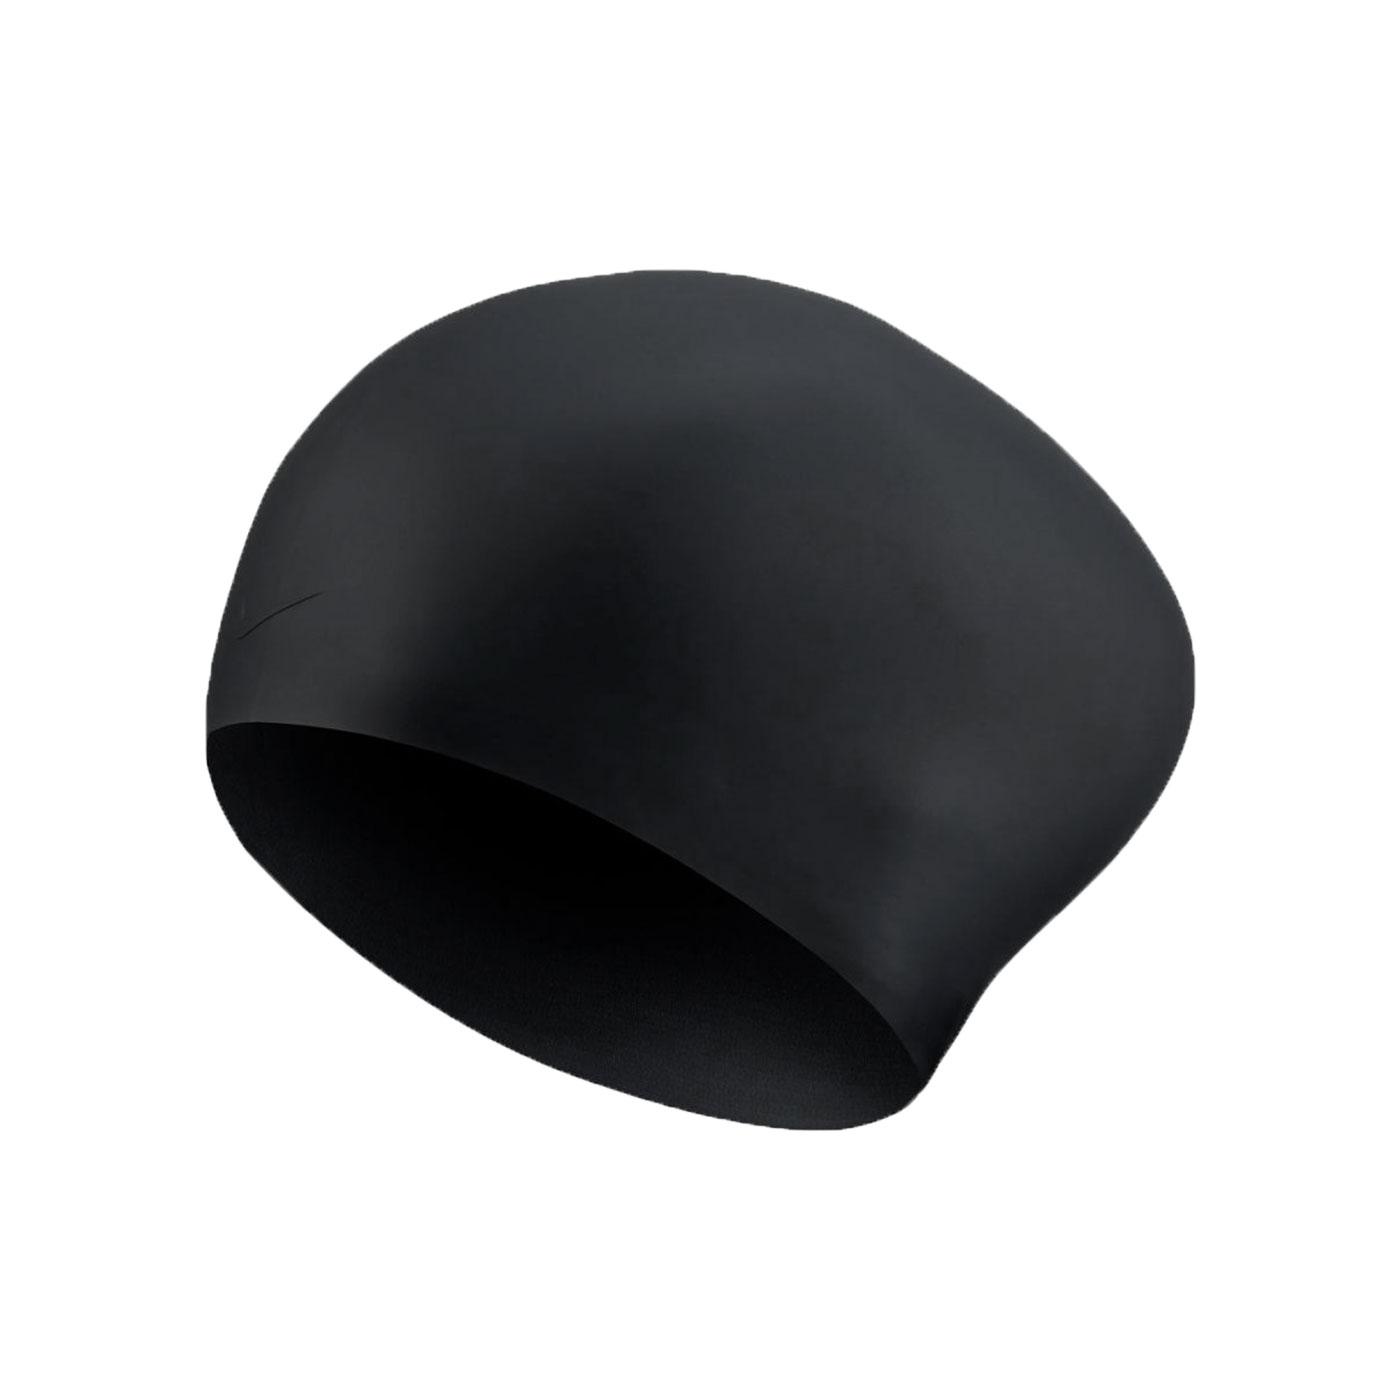 NIKE SWIM 成人長髮用矽膠泳帽 NESSA198-001 - 黑